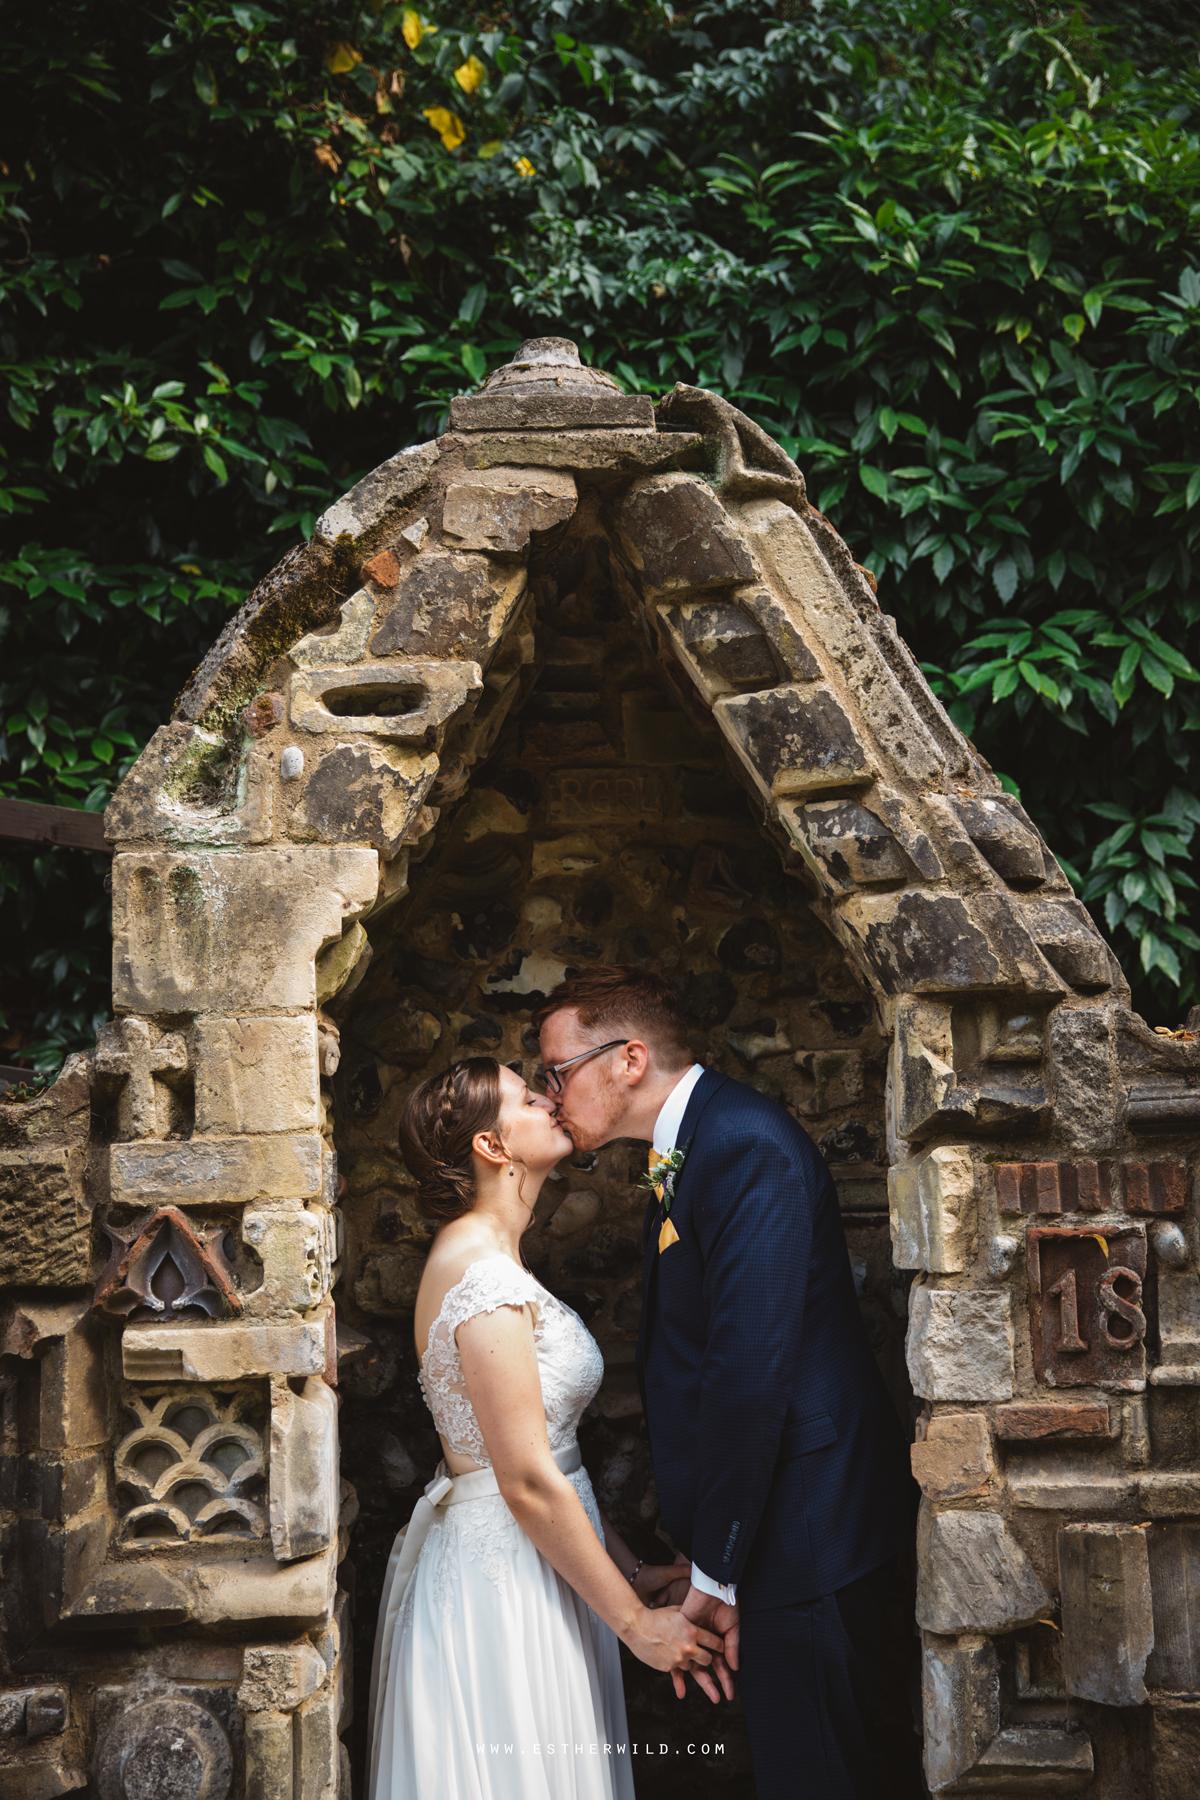 The_Georgian_Townhouse_Wedding_Norwich_Esther_Wild_Photographer_3R8A1771.jpg